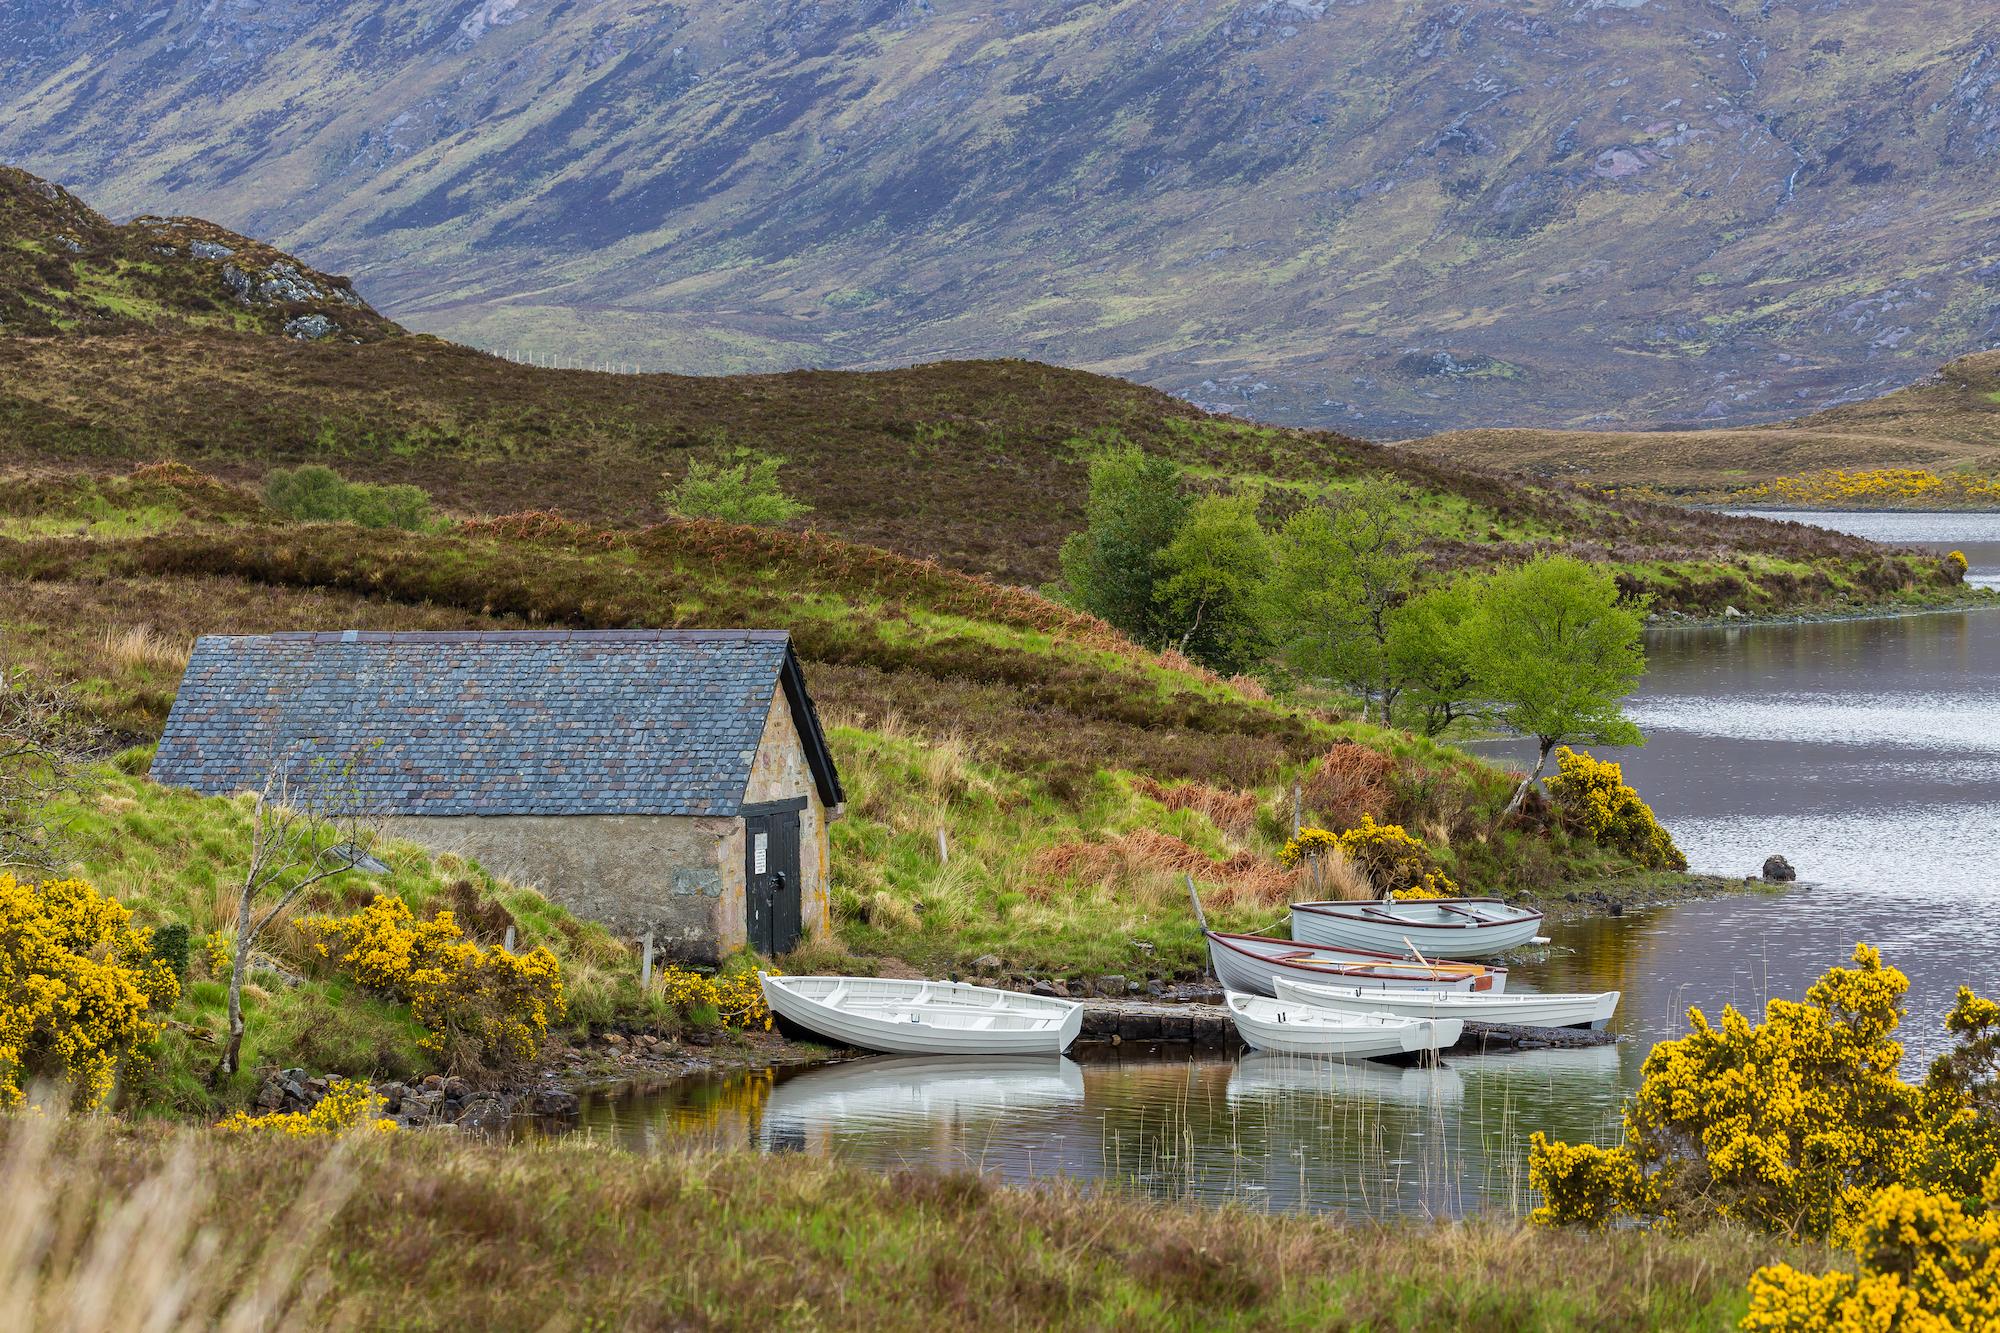 (178) Boathouse on Loch Stack, Laxford Bridge, Sutherland, Scotland. Copyright David Wheater.jpg